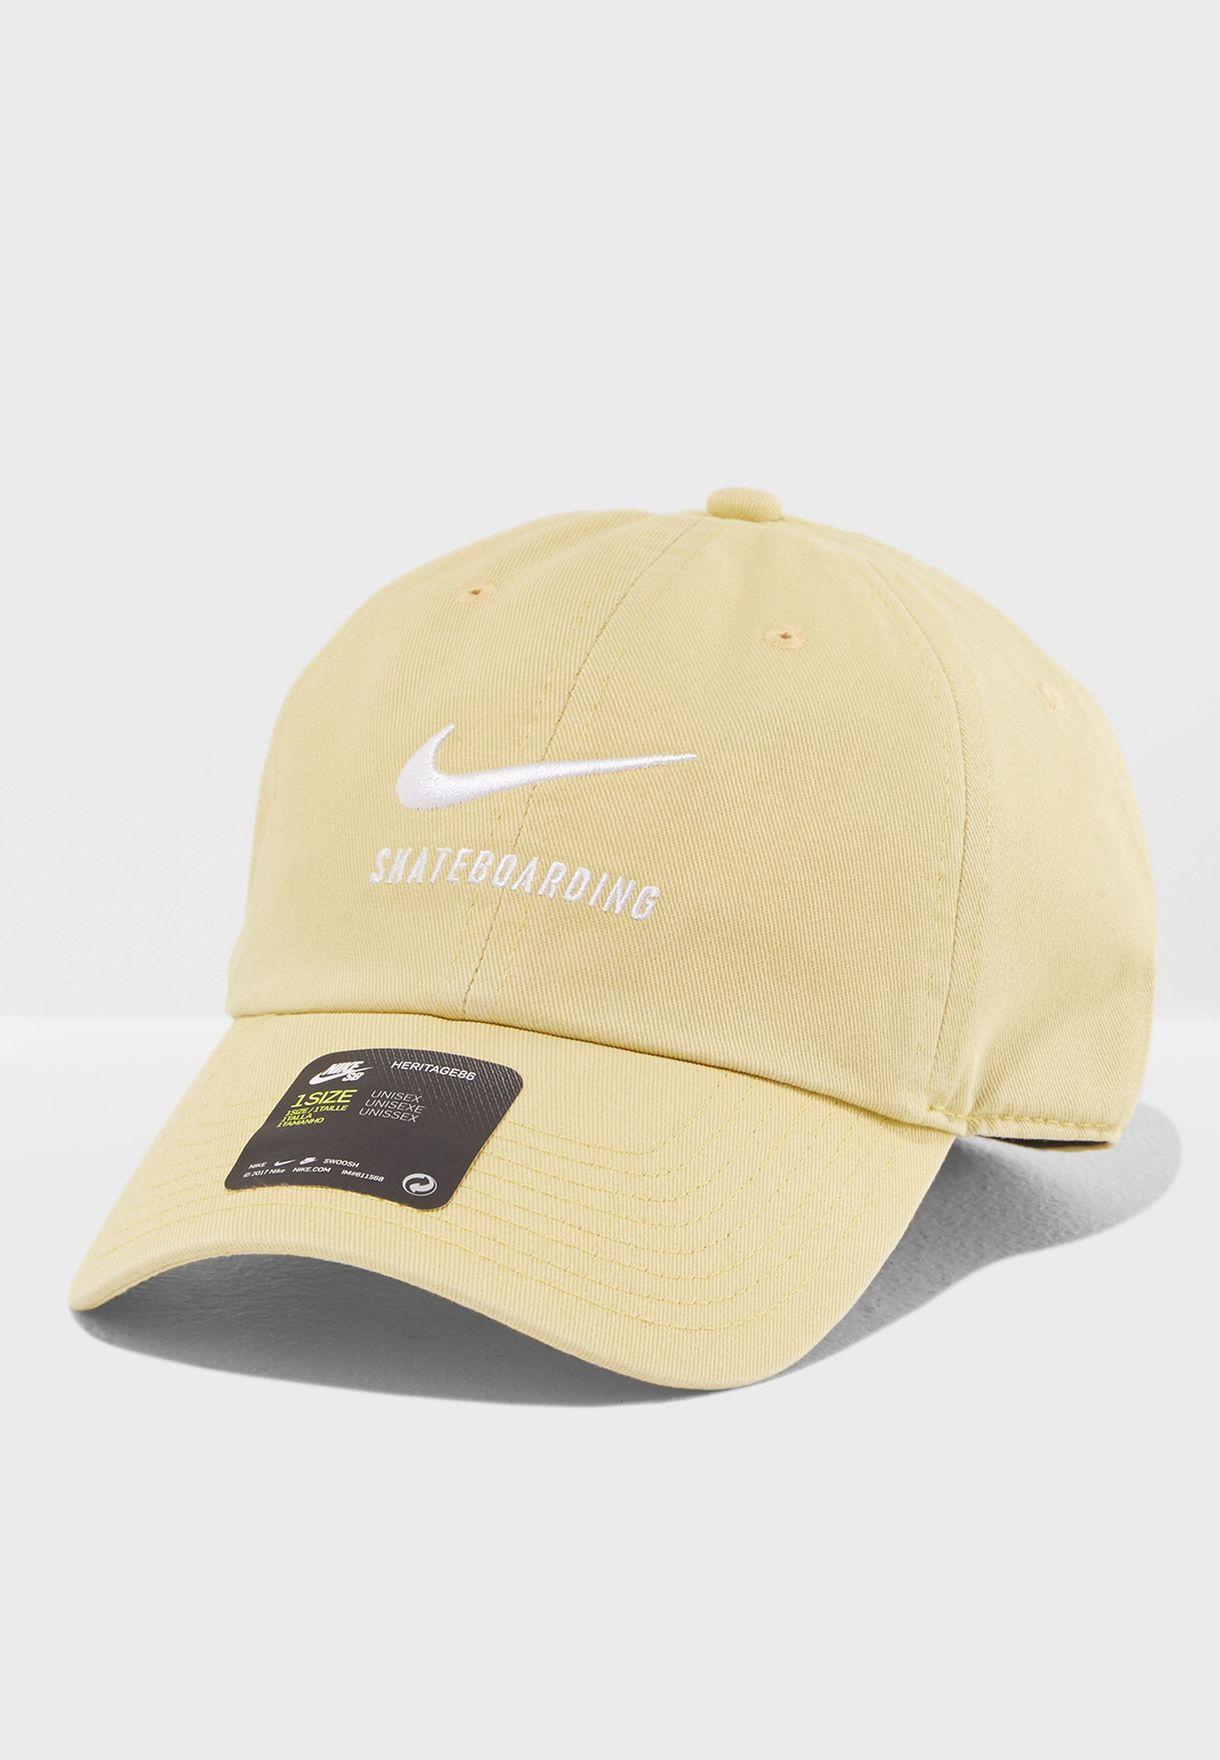 fb3f55e8c7afa spain lyst nike featherlight cap in yellow for men 52390 322ee  norway  heritage twill cap 7c3ea 63ecc